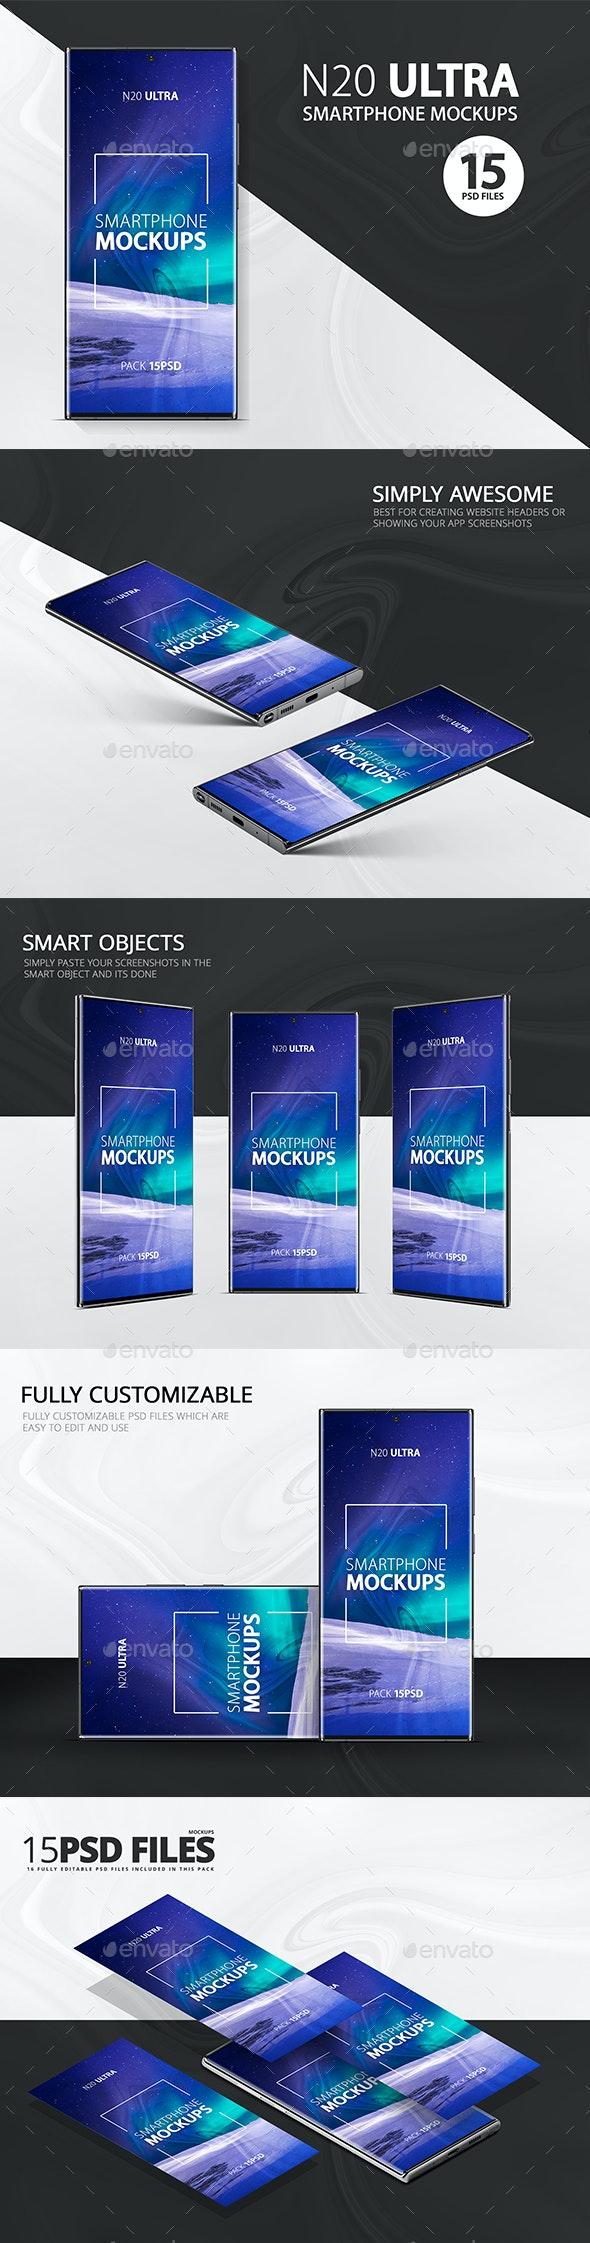 Note 20 Ultra Smartphone Mockups - Product Mock-Ups Graphics